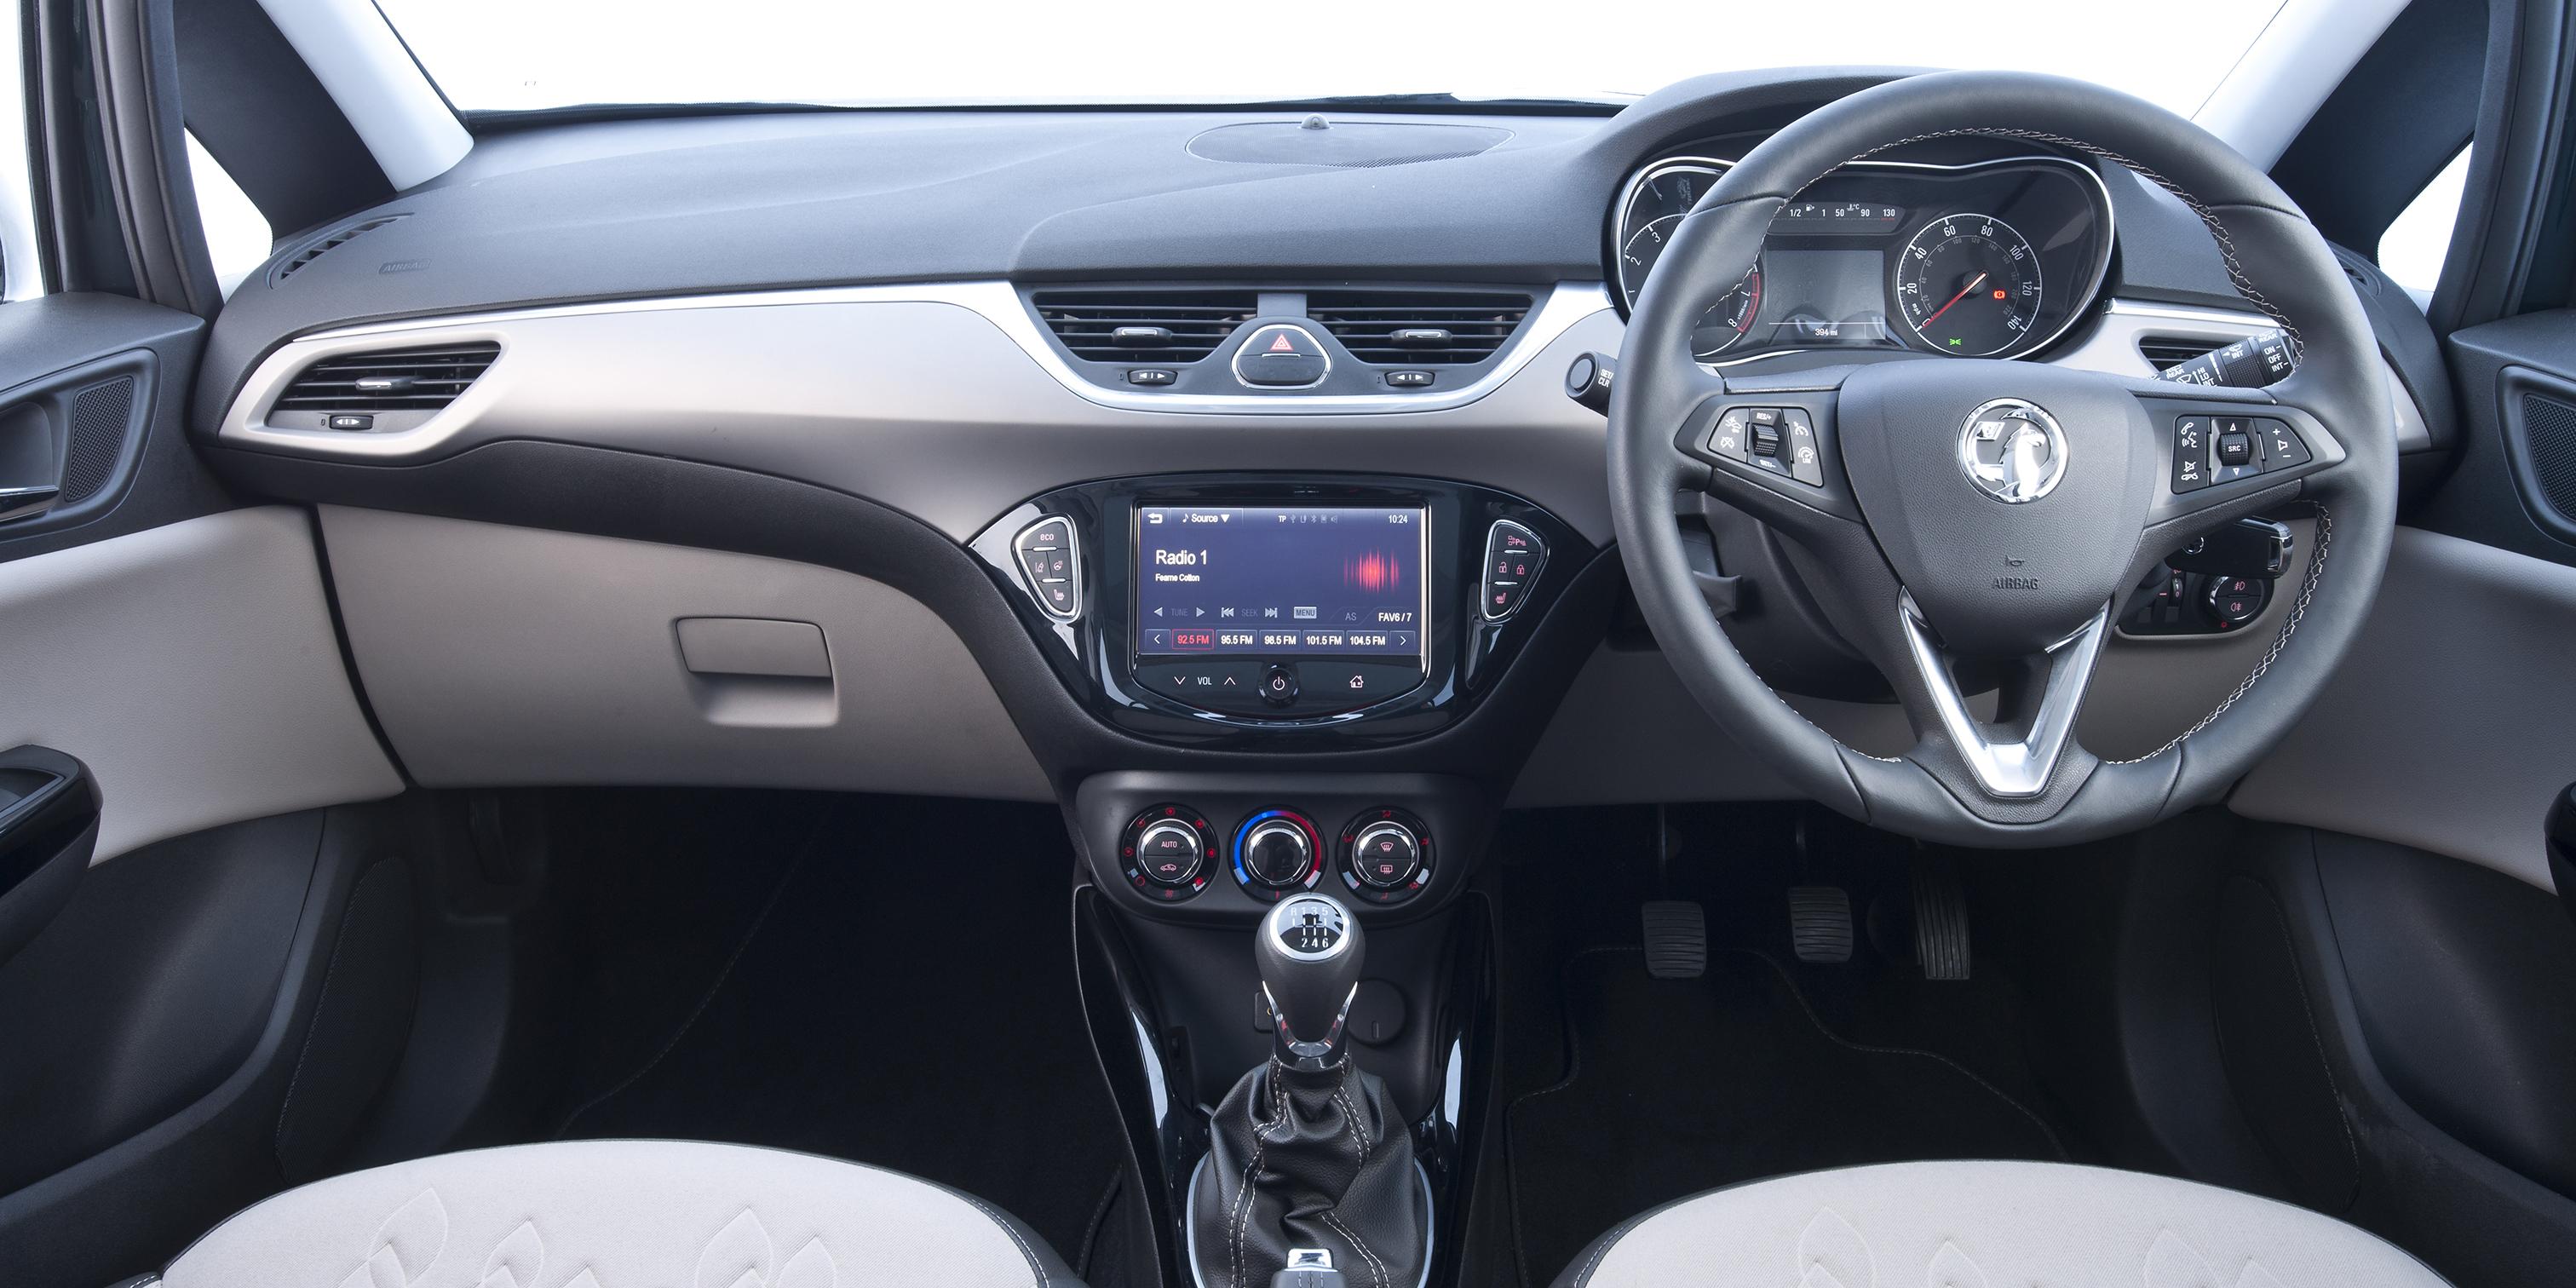 Vauxhall Corsa Interior Amp Infotainment Carwow